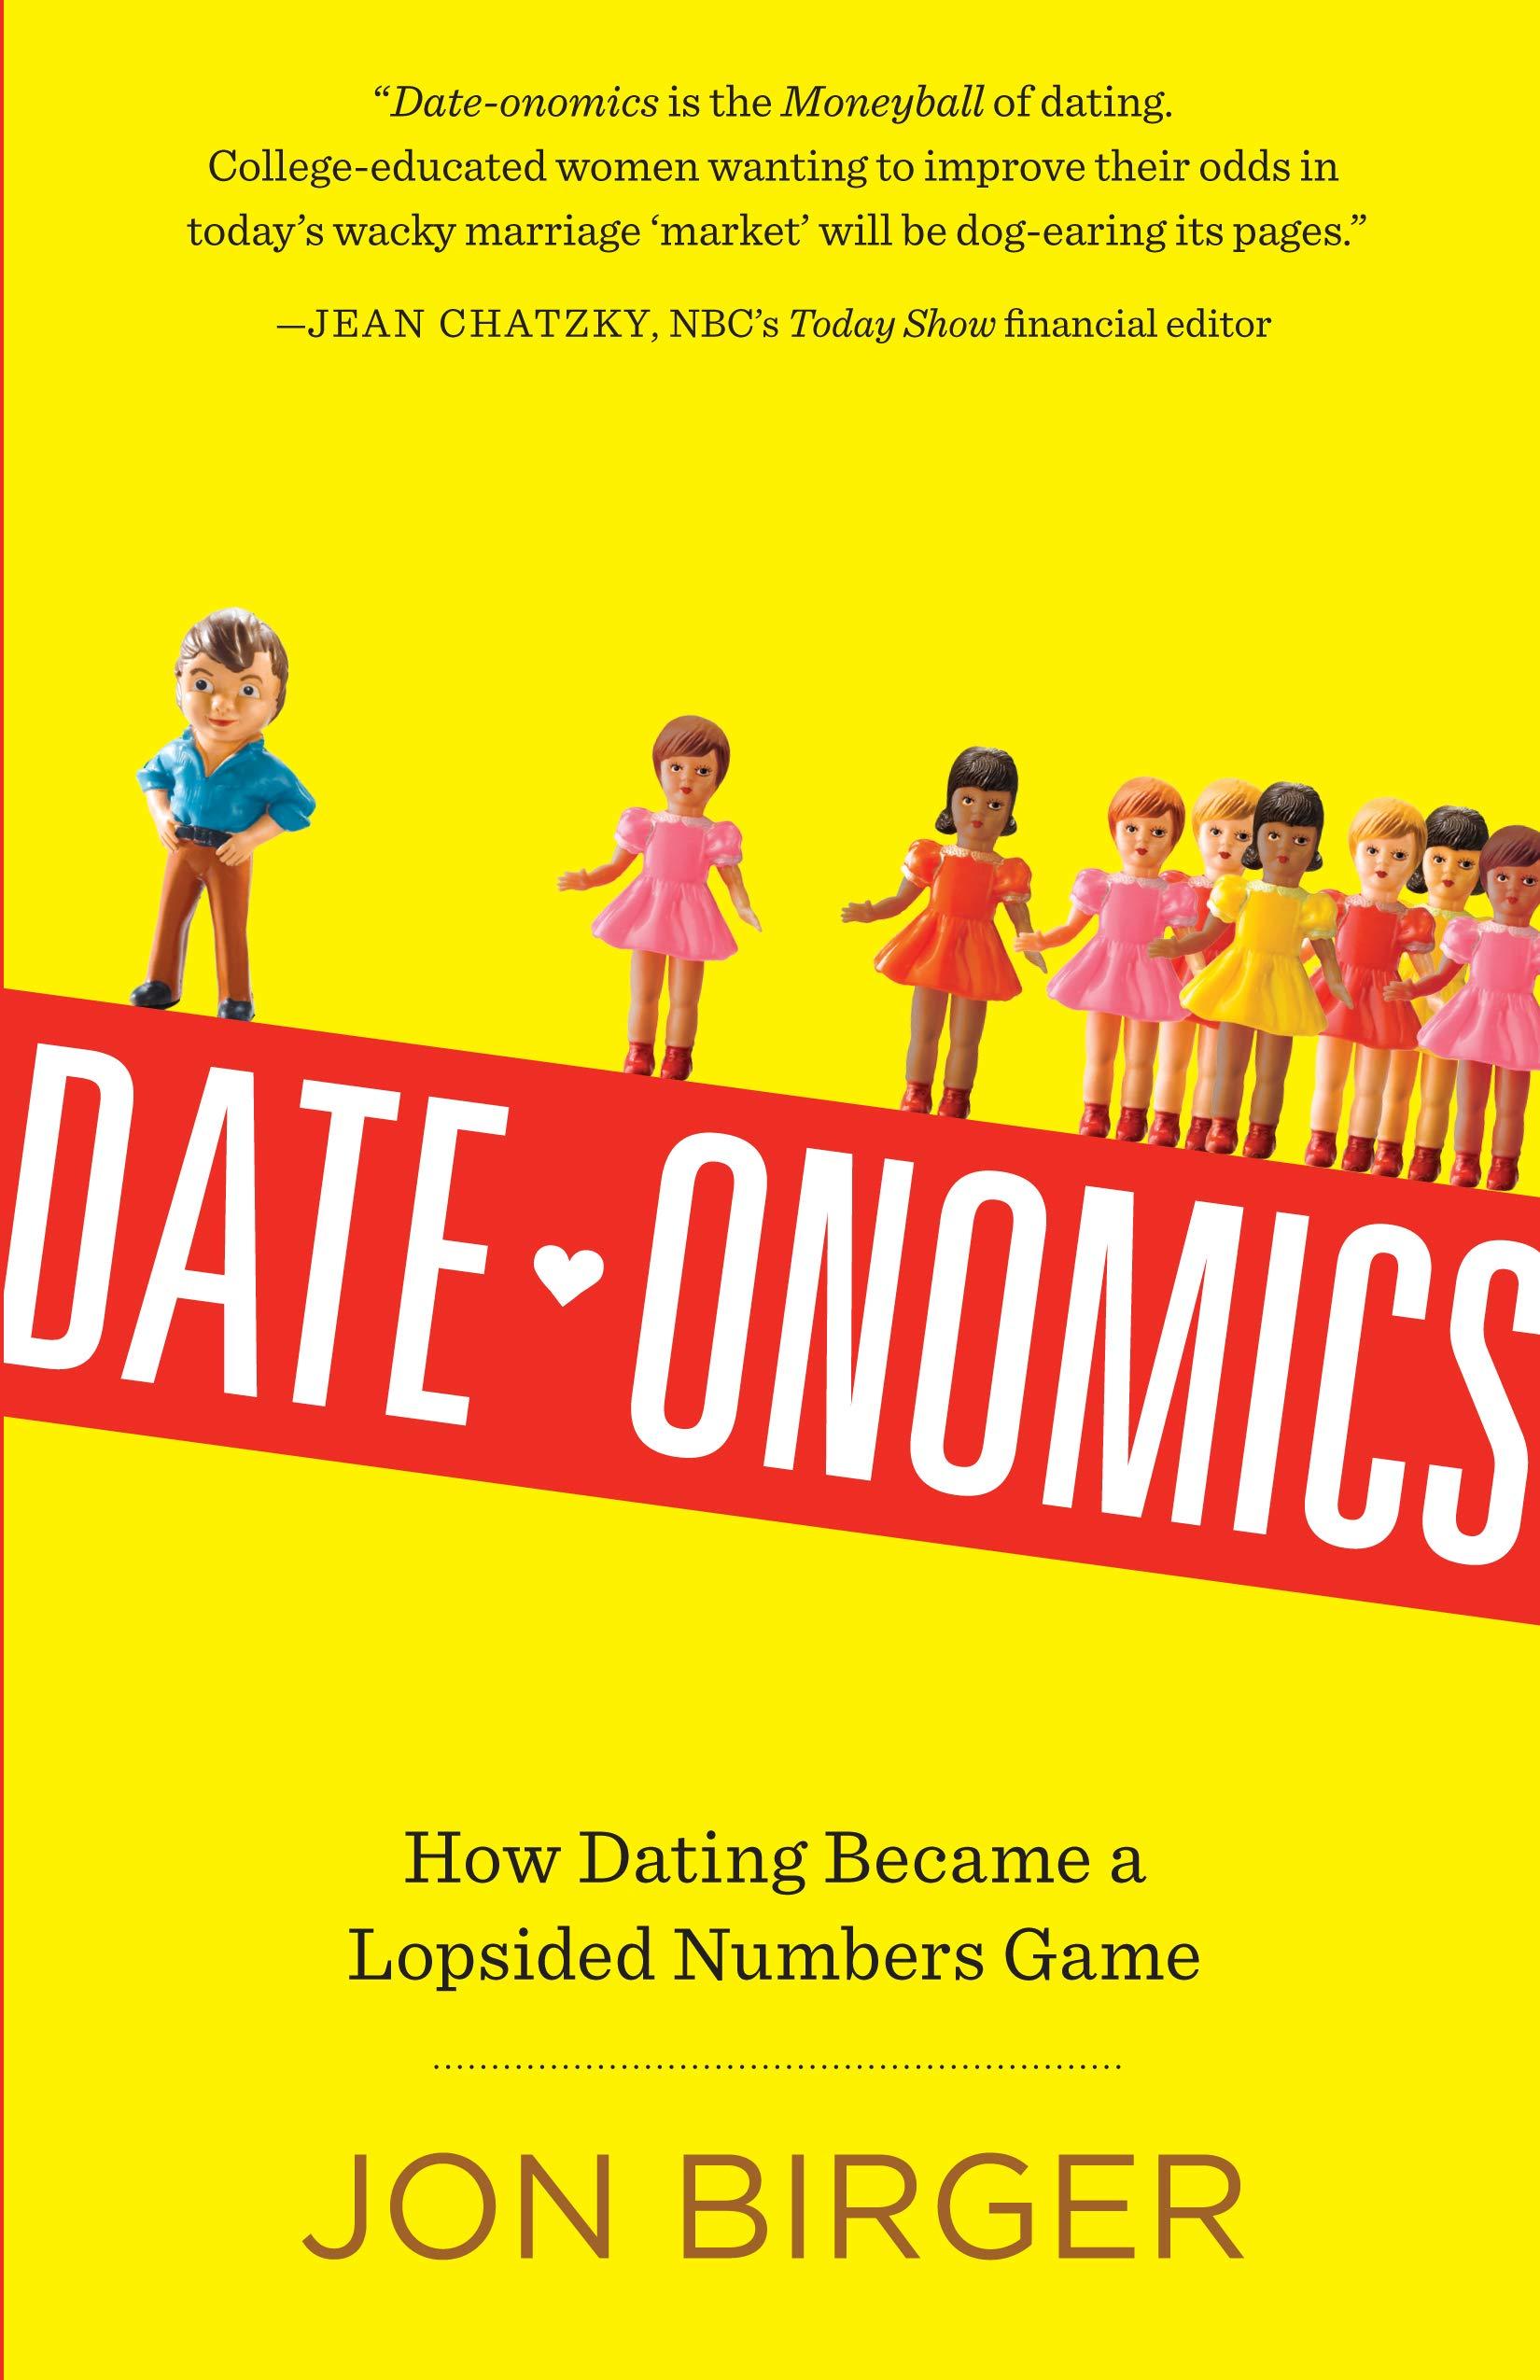 dating sociologie)